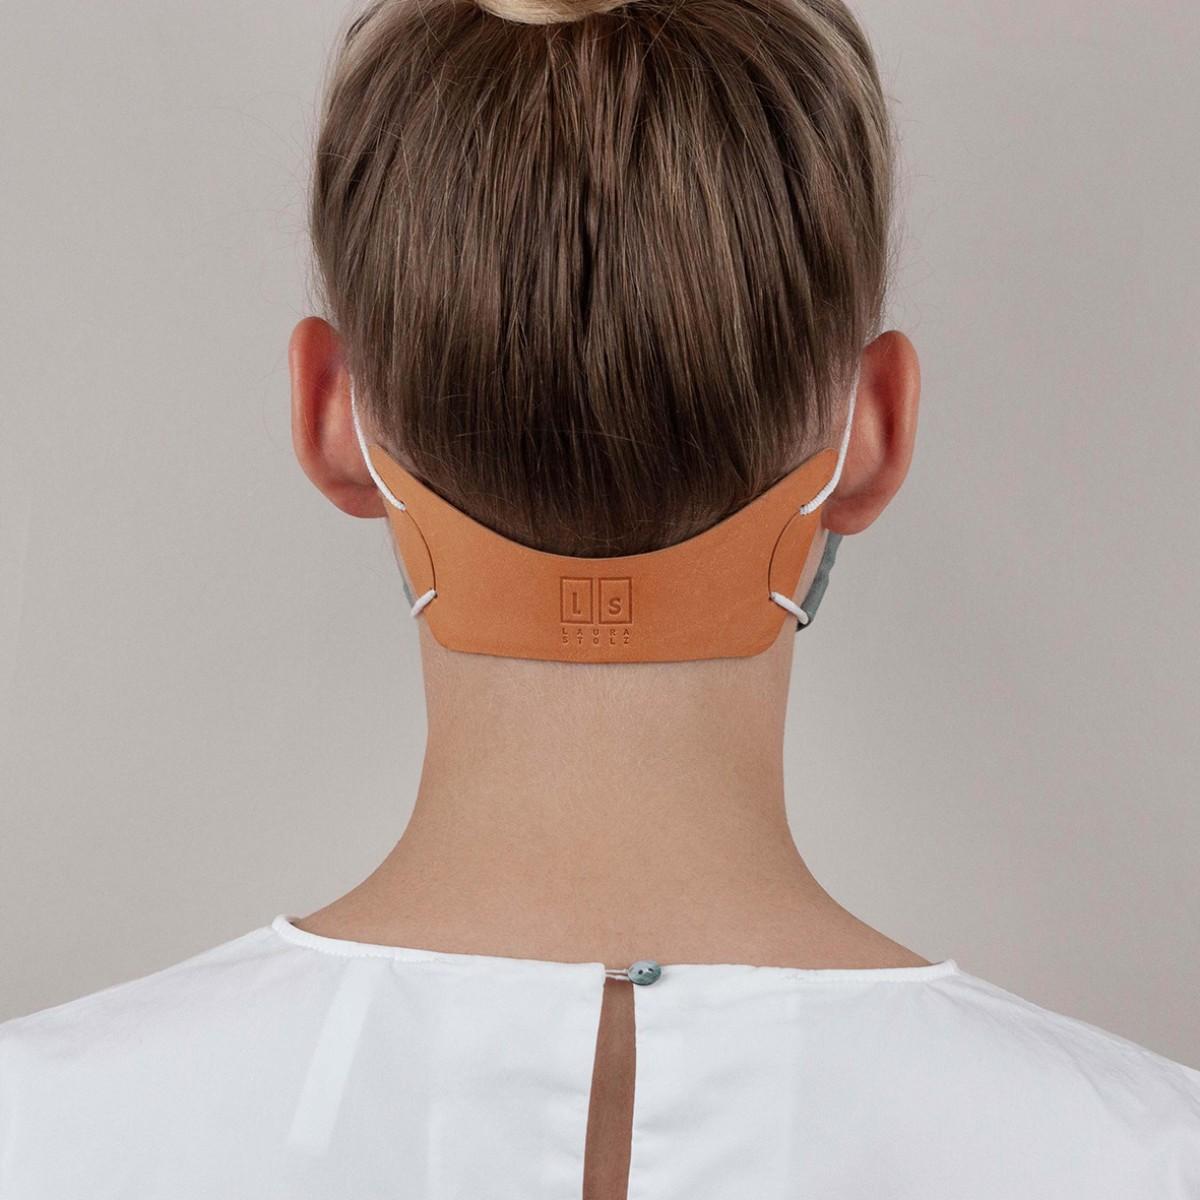 Laura Stolz / Extender / Maskenverlängerung / pflanzlich gegerbtes Leder / beige